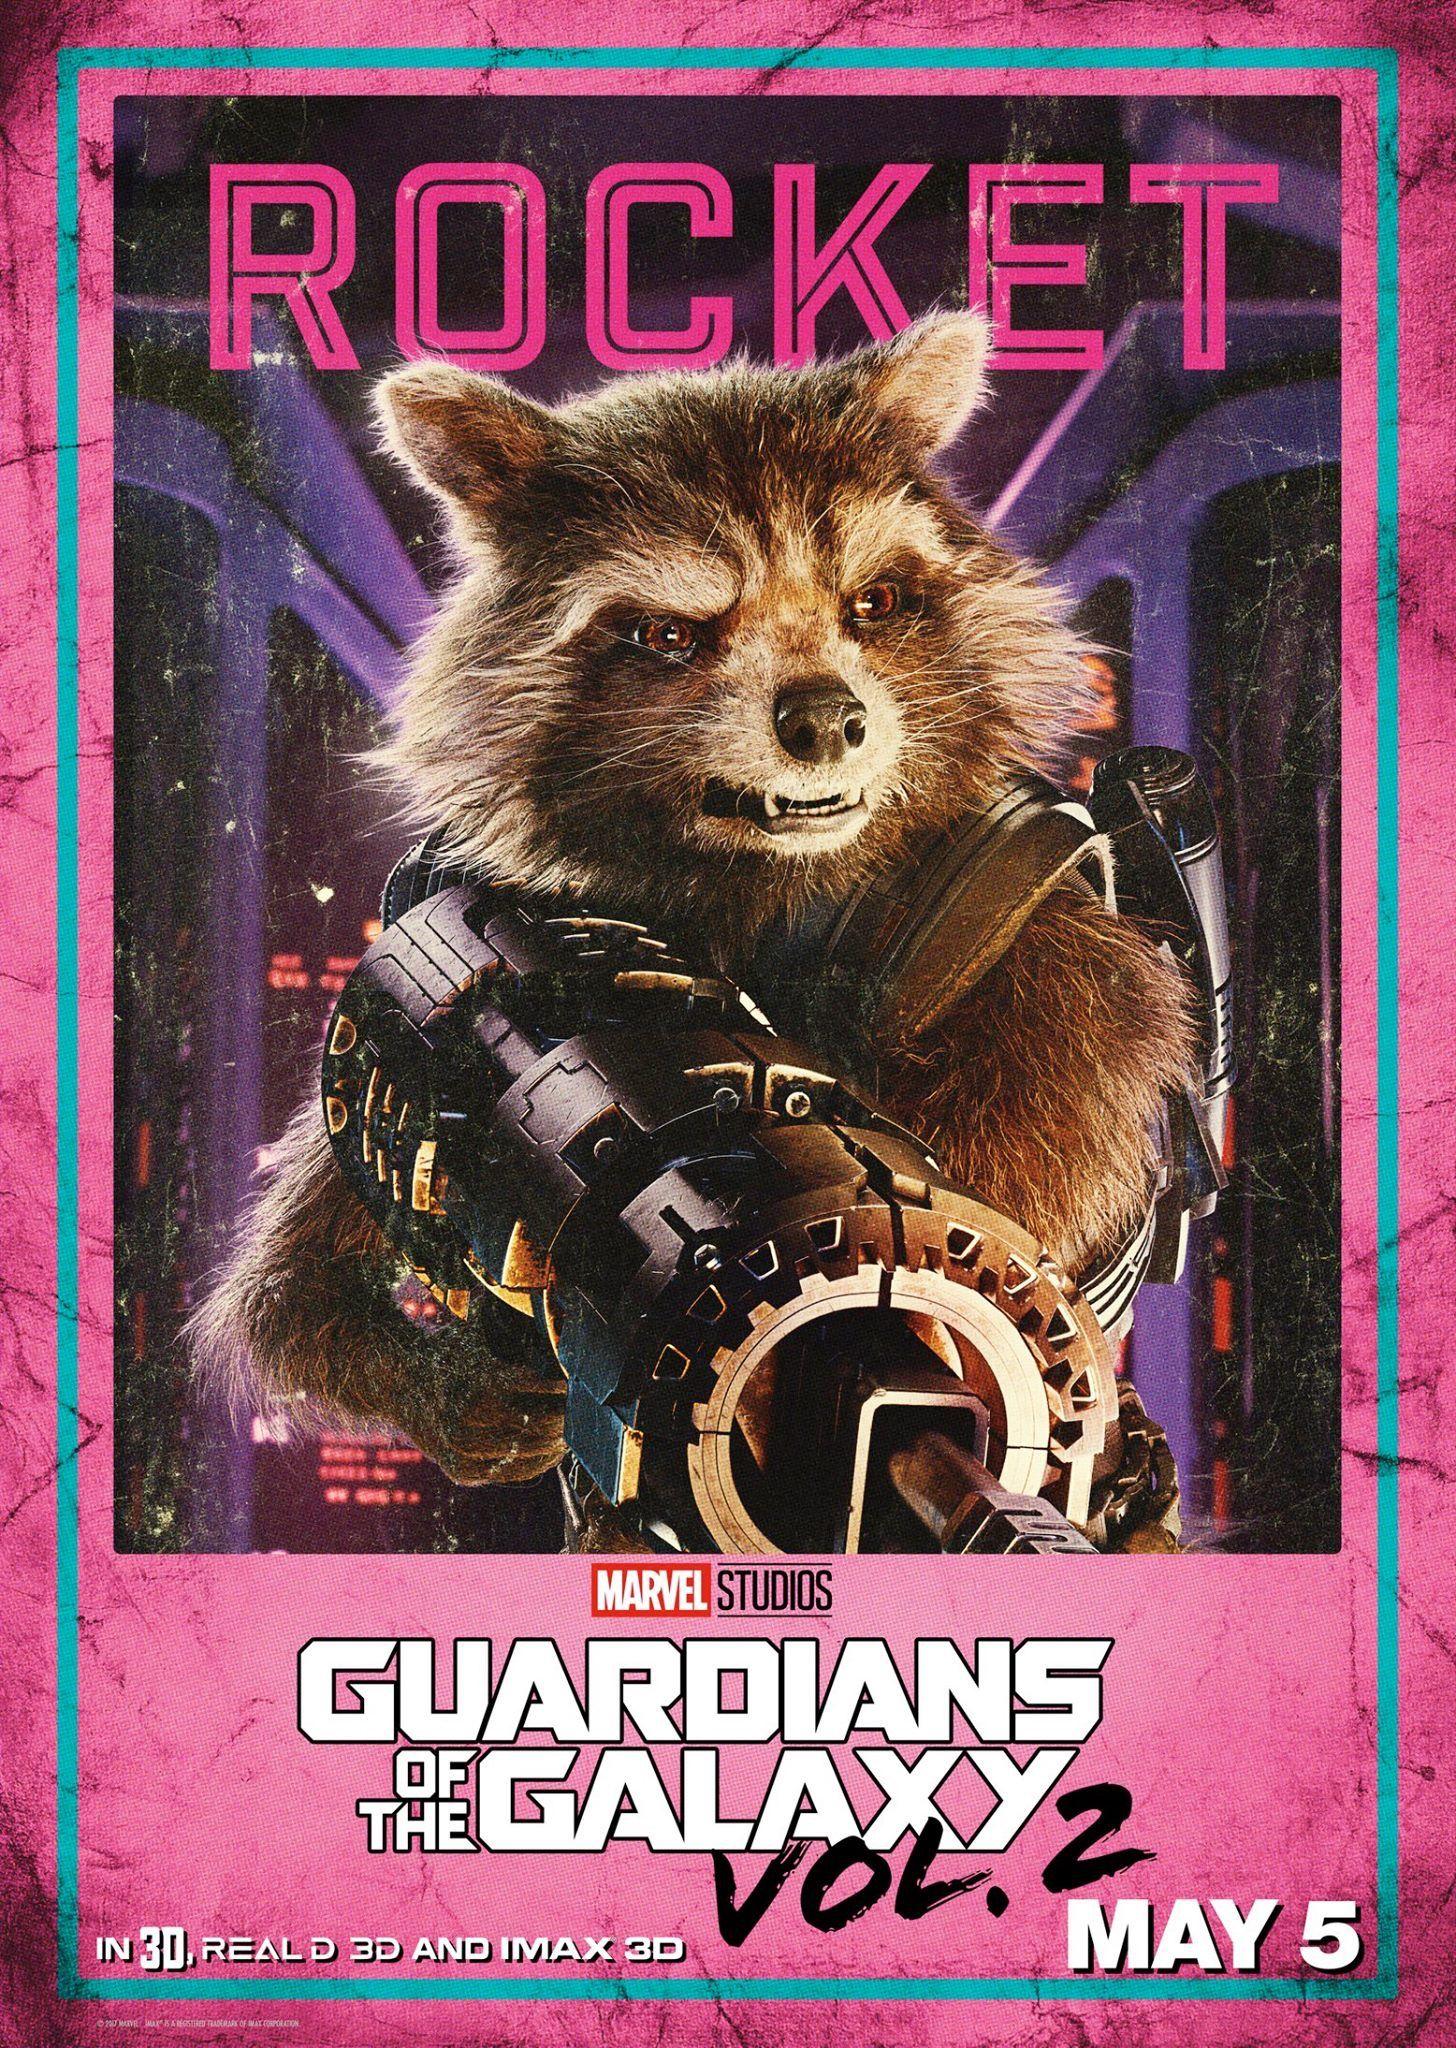 Rocket Guardians Of The Galaxy Vol 2 Gardians Of The Galaxy Guardians Of The Galaxy